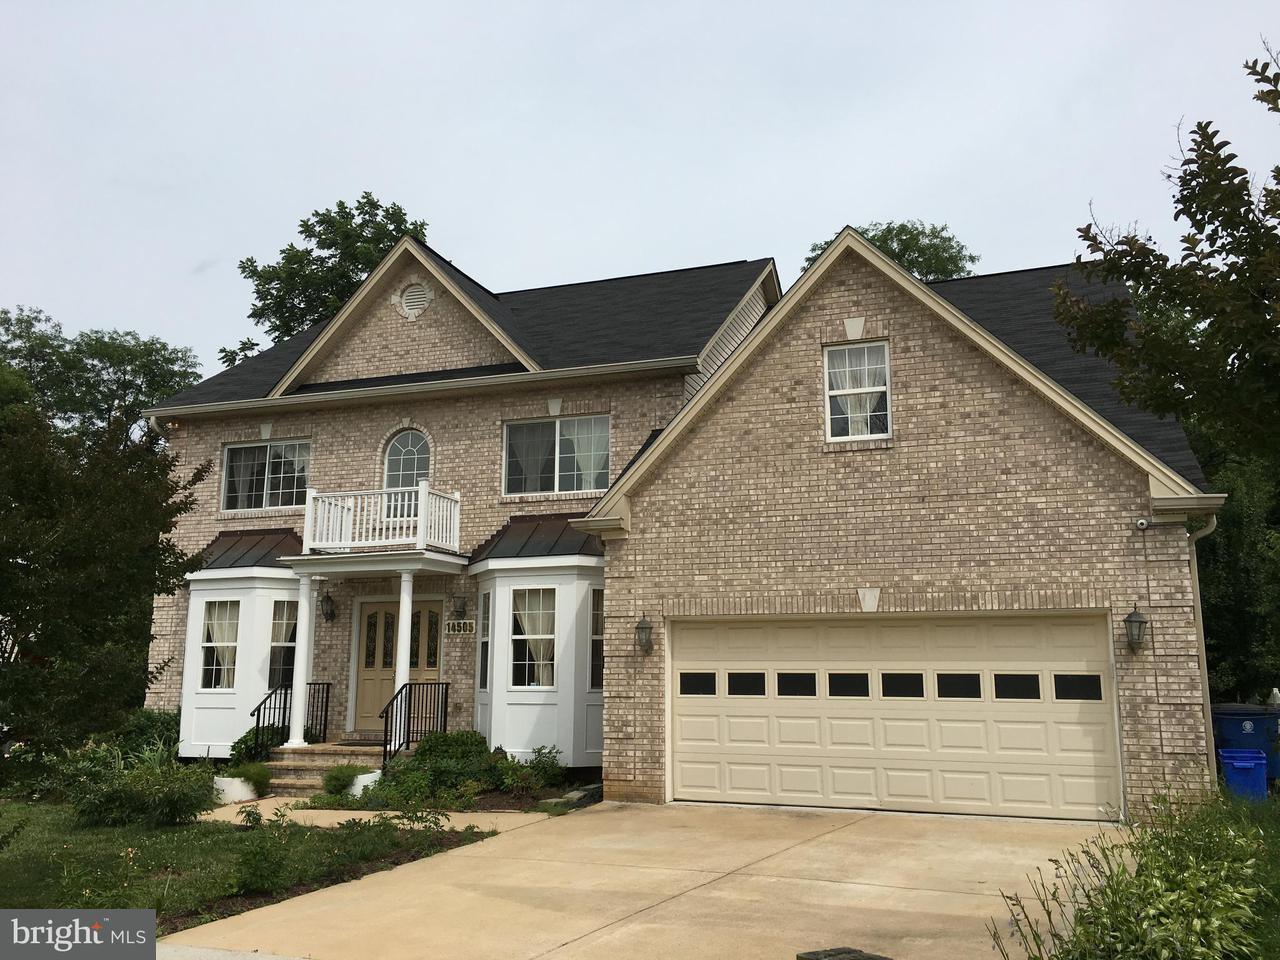 Single Family Home for Sale at 14505 Golden Eagle Court 14505 Golden Eagle Court Burtonsville, Maryland 20866 United States